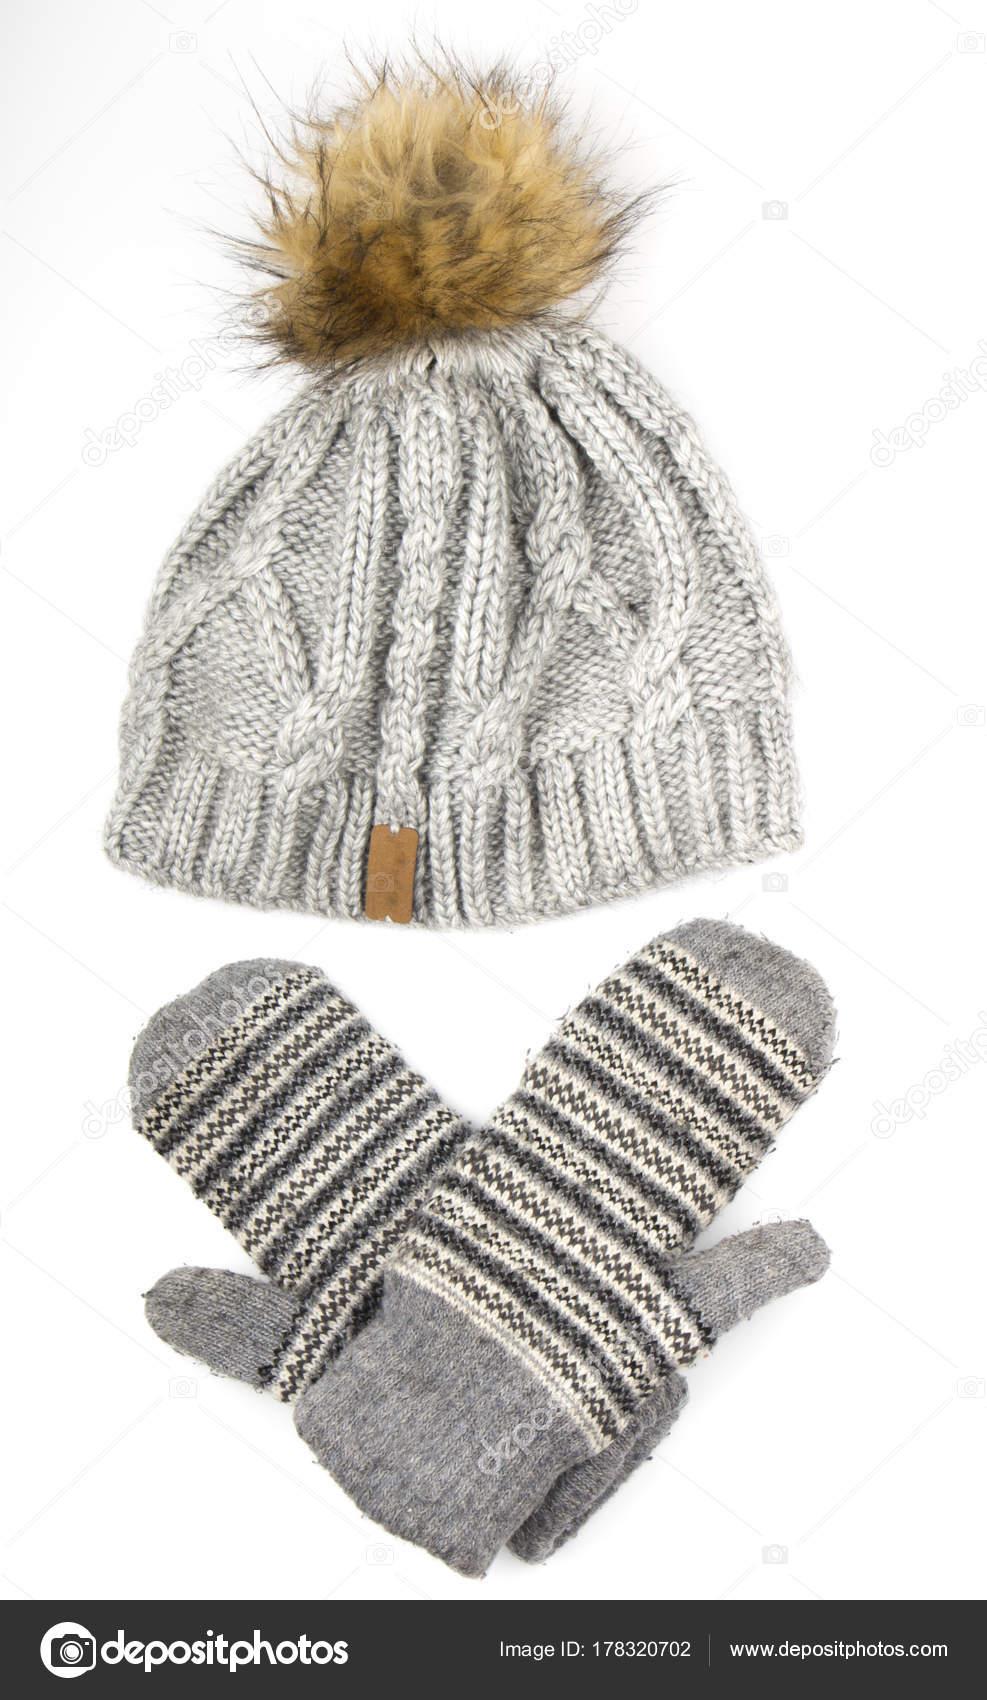 66535e0d1834 Ropa para una temporada de frío: gorro de lana, guantes de — Foto de ...